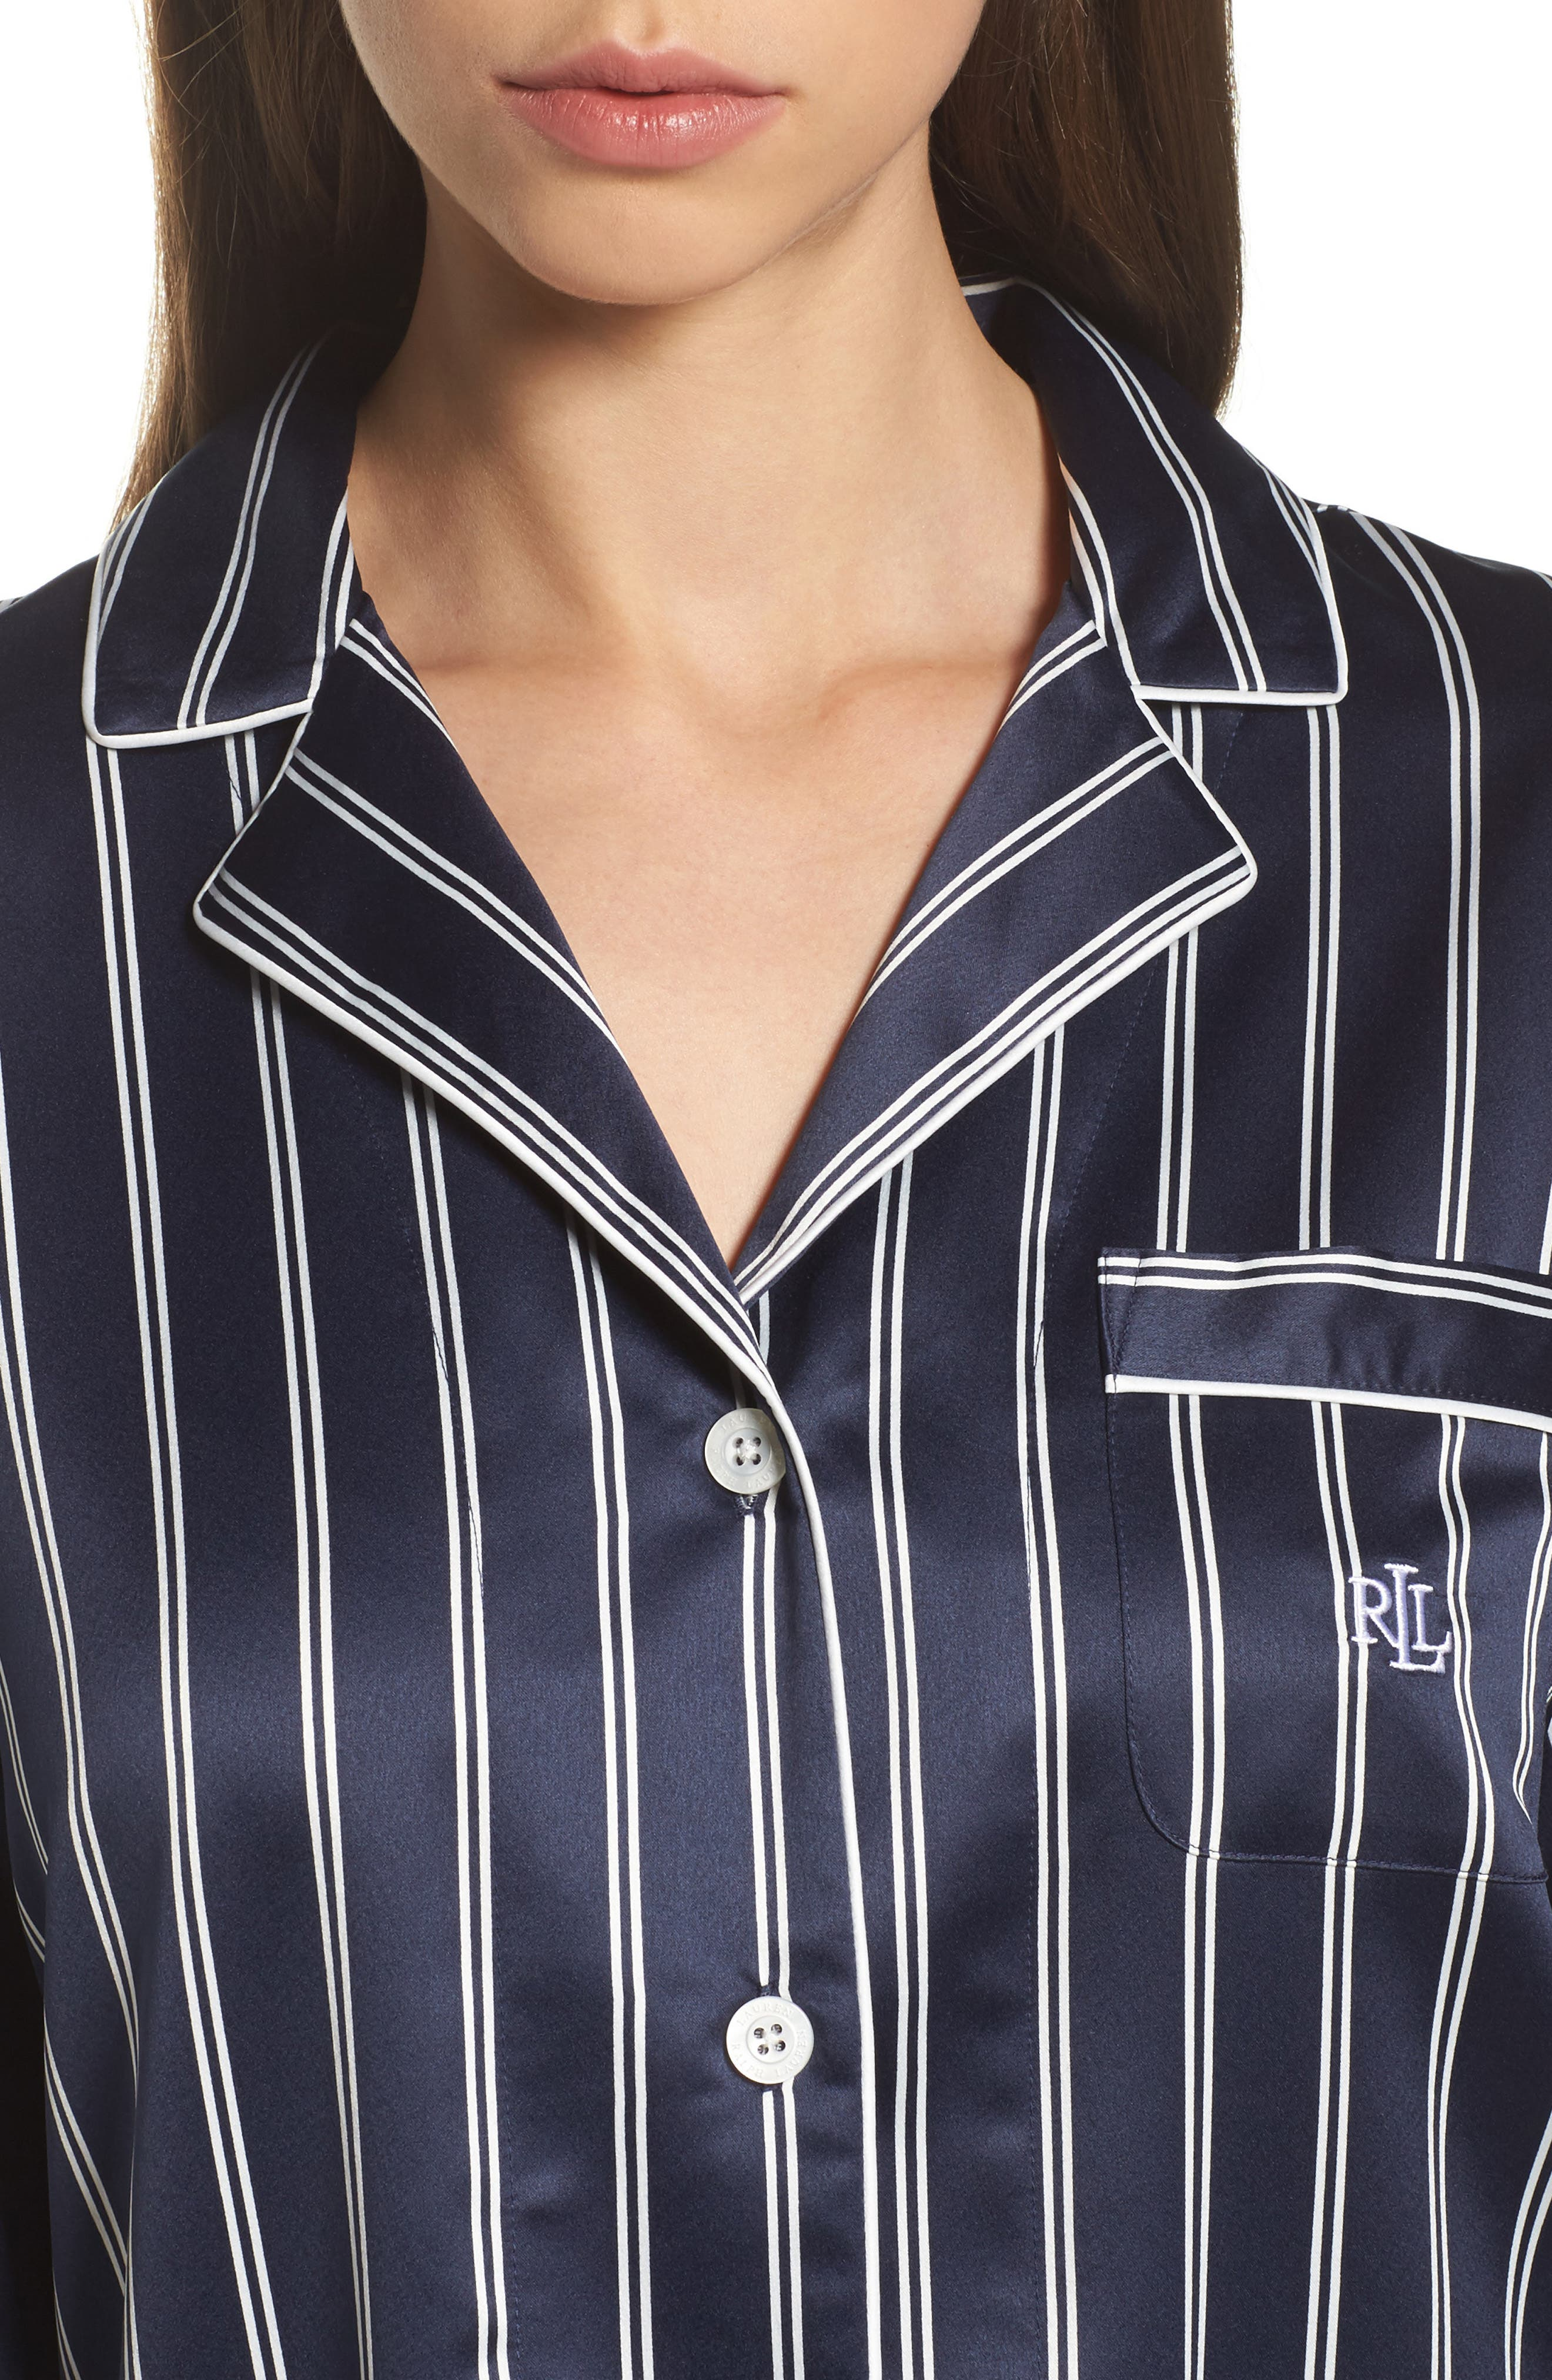 Satin Pajamas,                             Alternate thumbnail 4, color,                             Navy Stripe